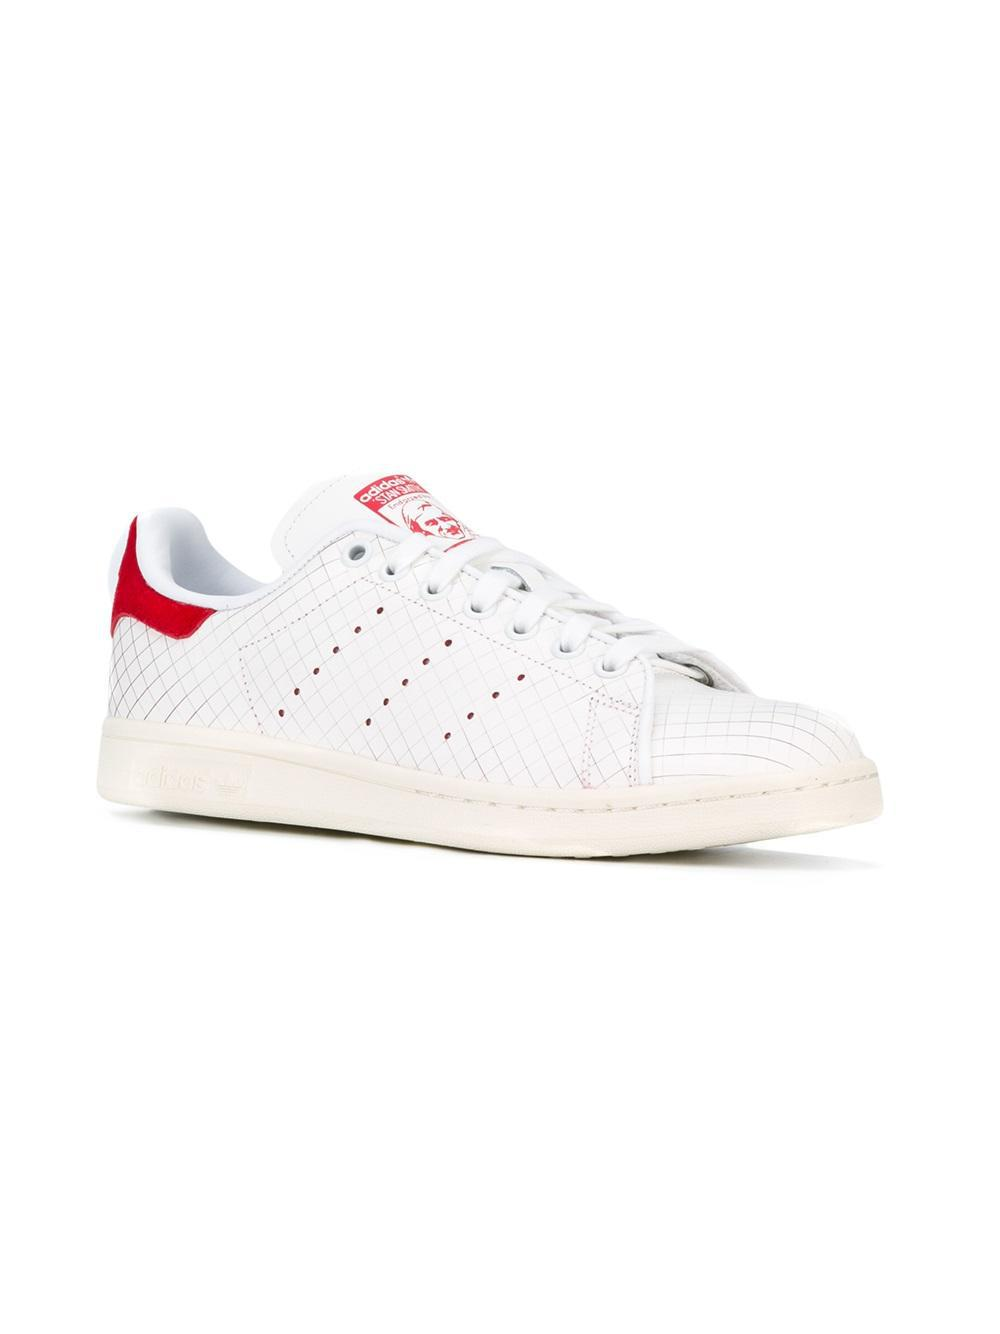 adidas Originals Cotton 'stan Smith' Sneakers in White